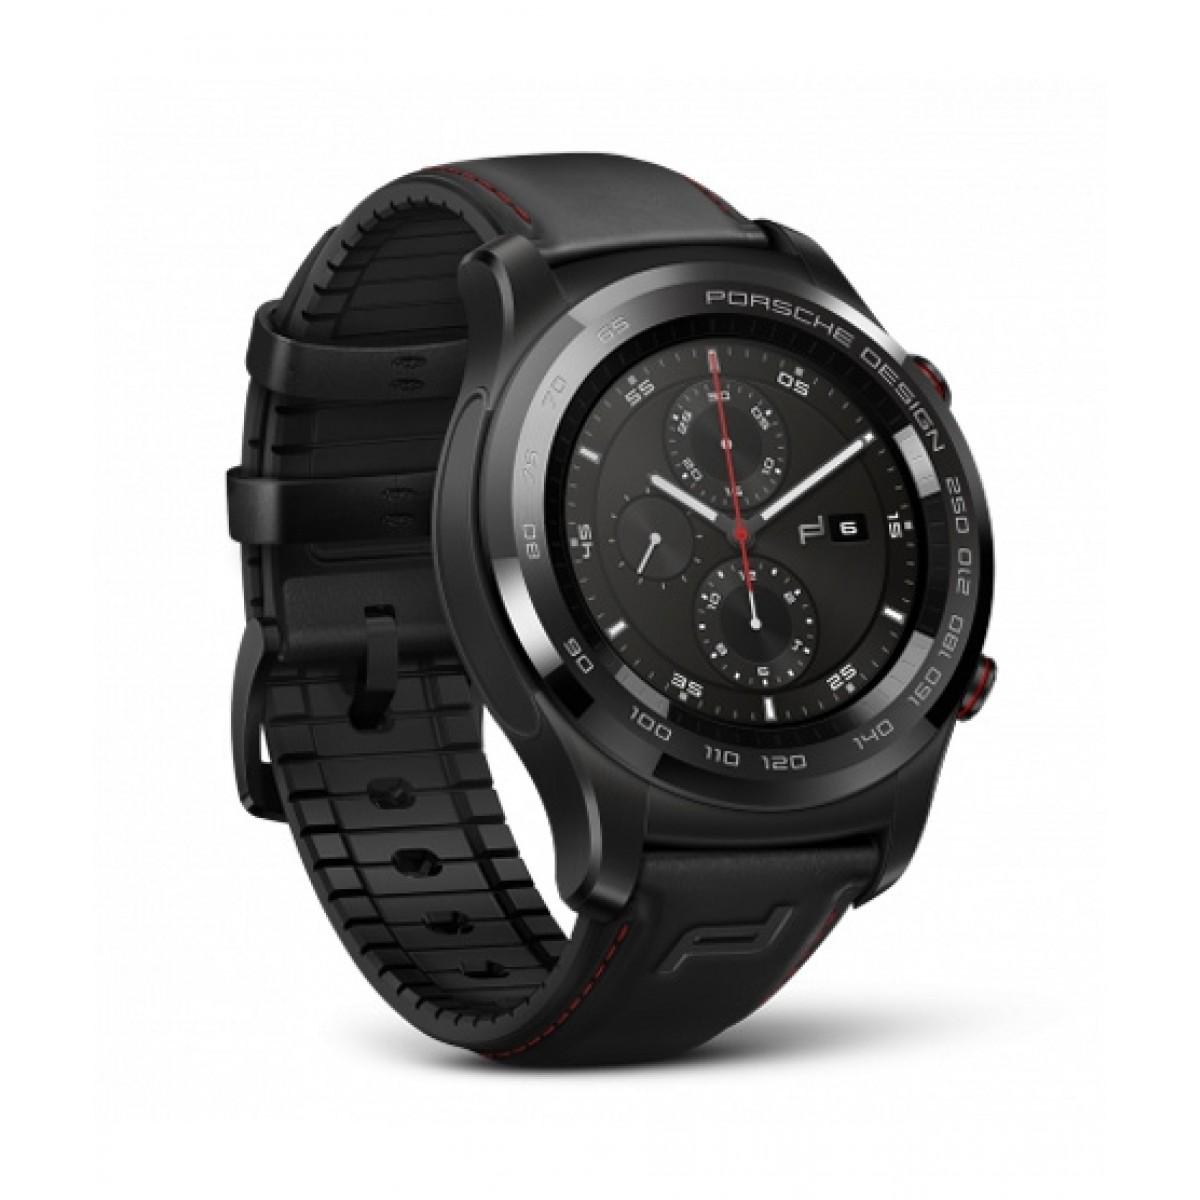 1dde3146e07e Huawei Porsche Design Smartwatch Price in Pakistan